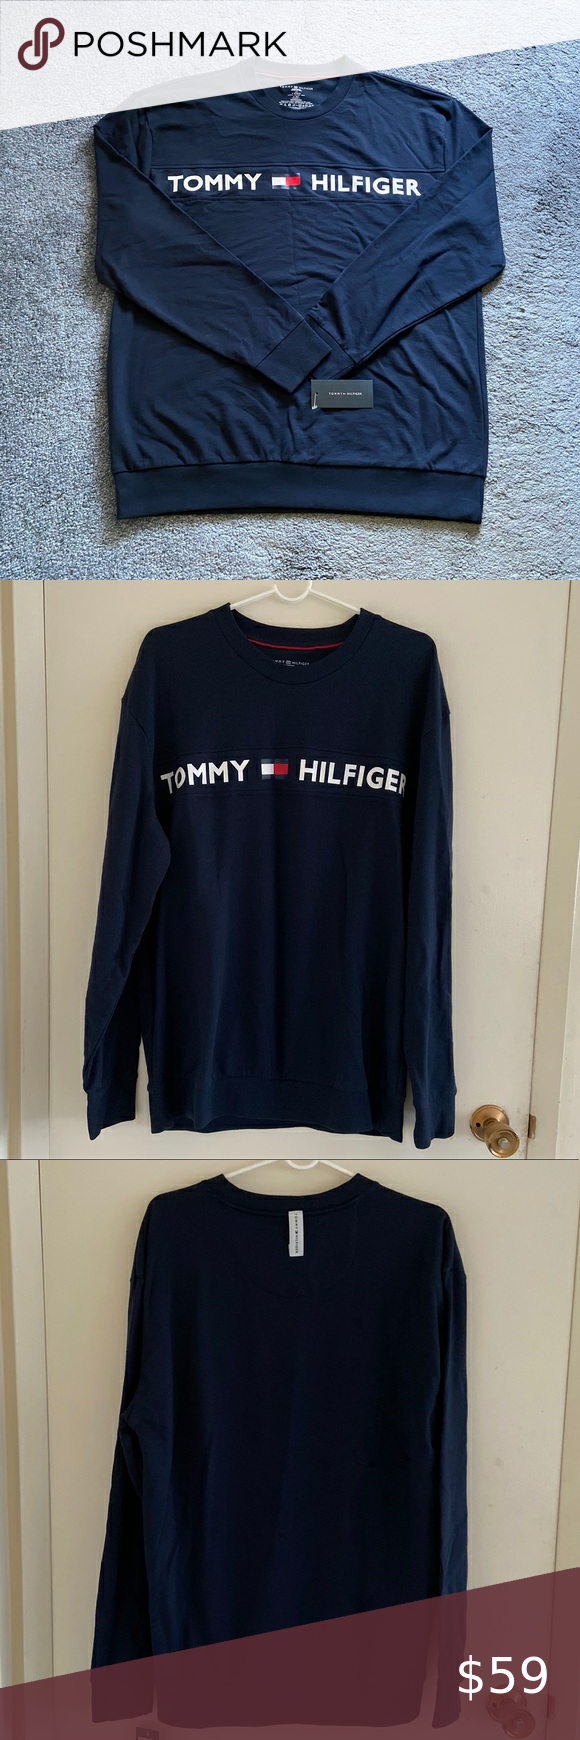 Tommy Hilfiger Men S Sweatshirt Clothes Design Tommy Hilfiger Shirts Long Sleeve Tshirt Men [ 1740 x 580 Pixel ]